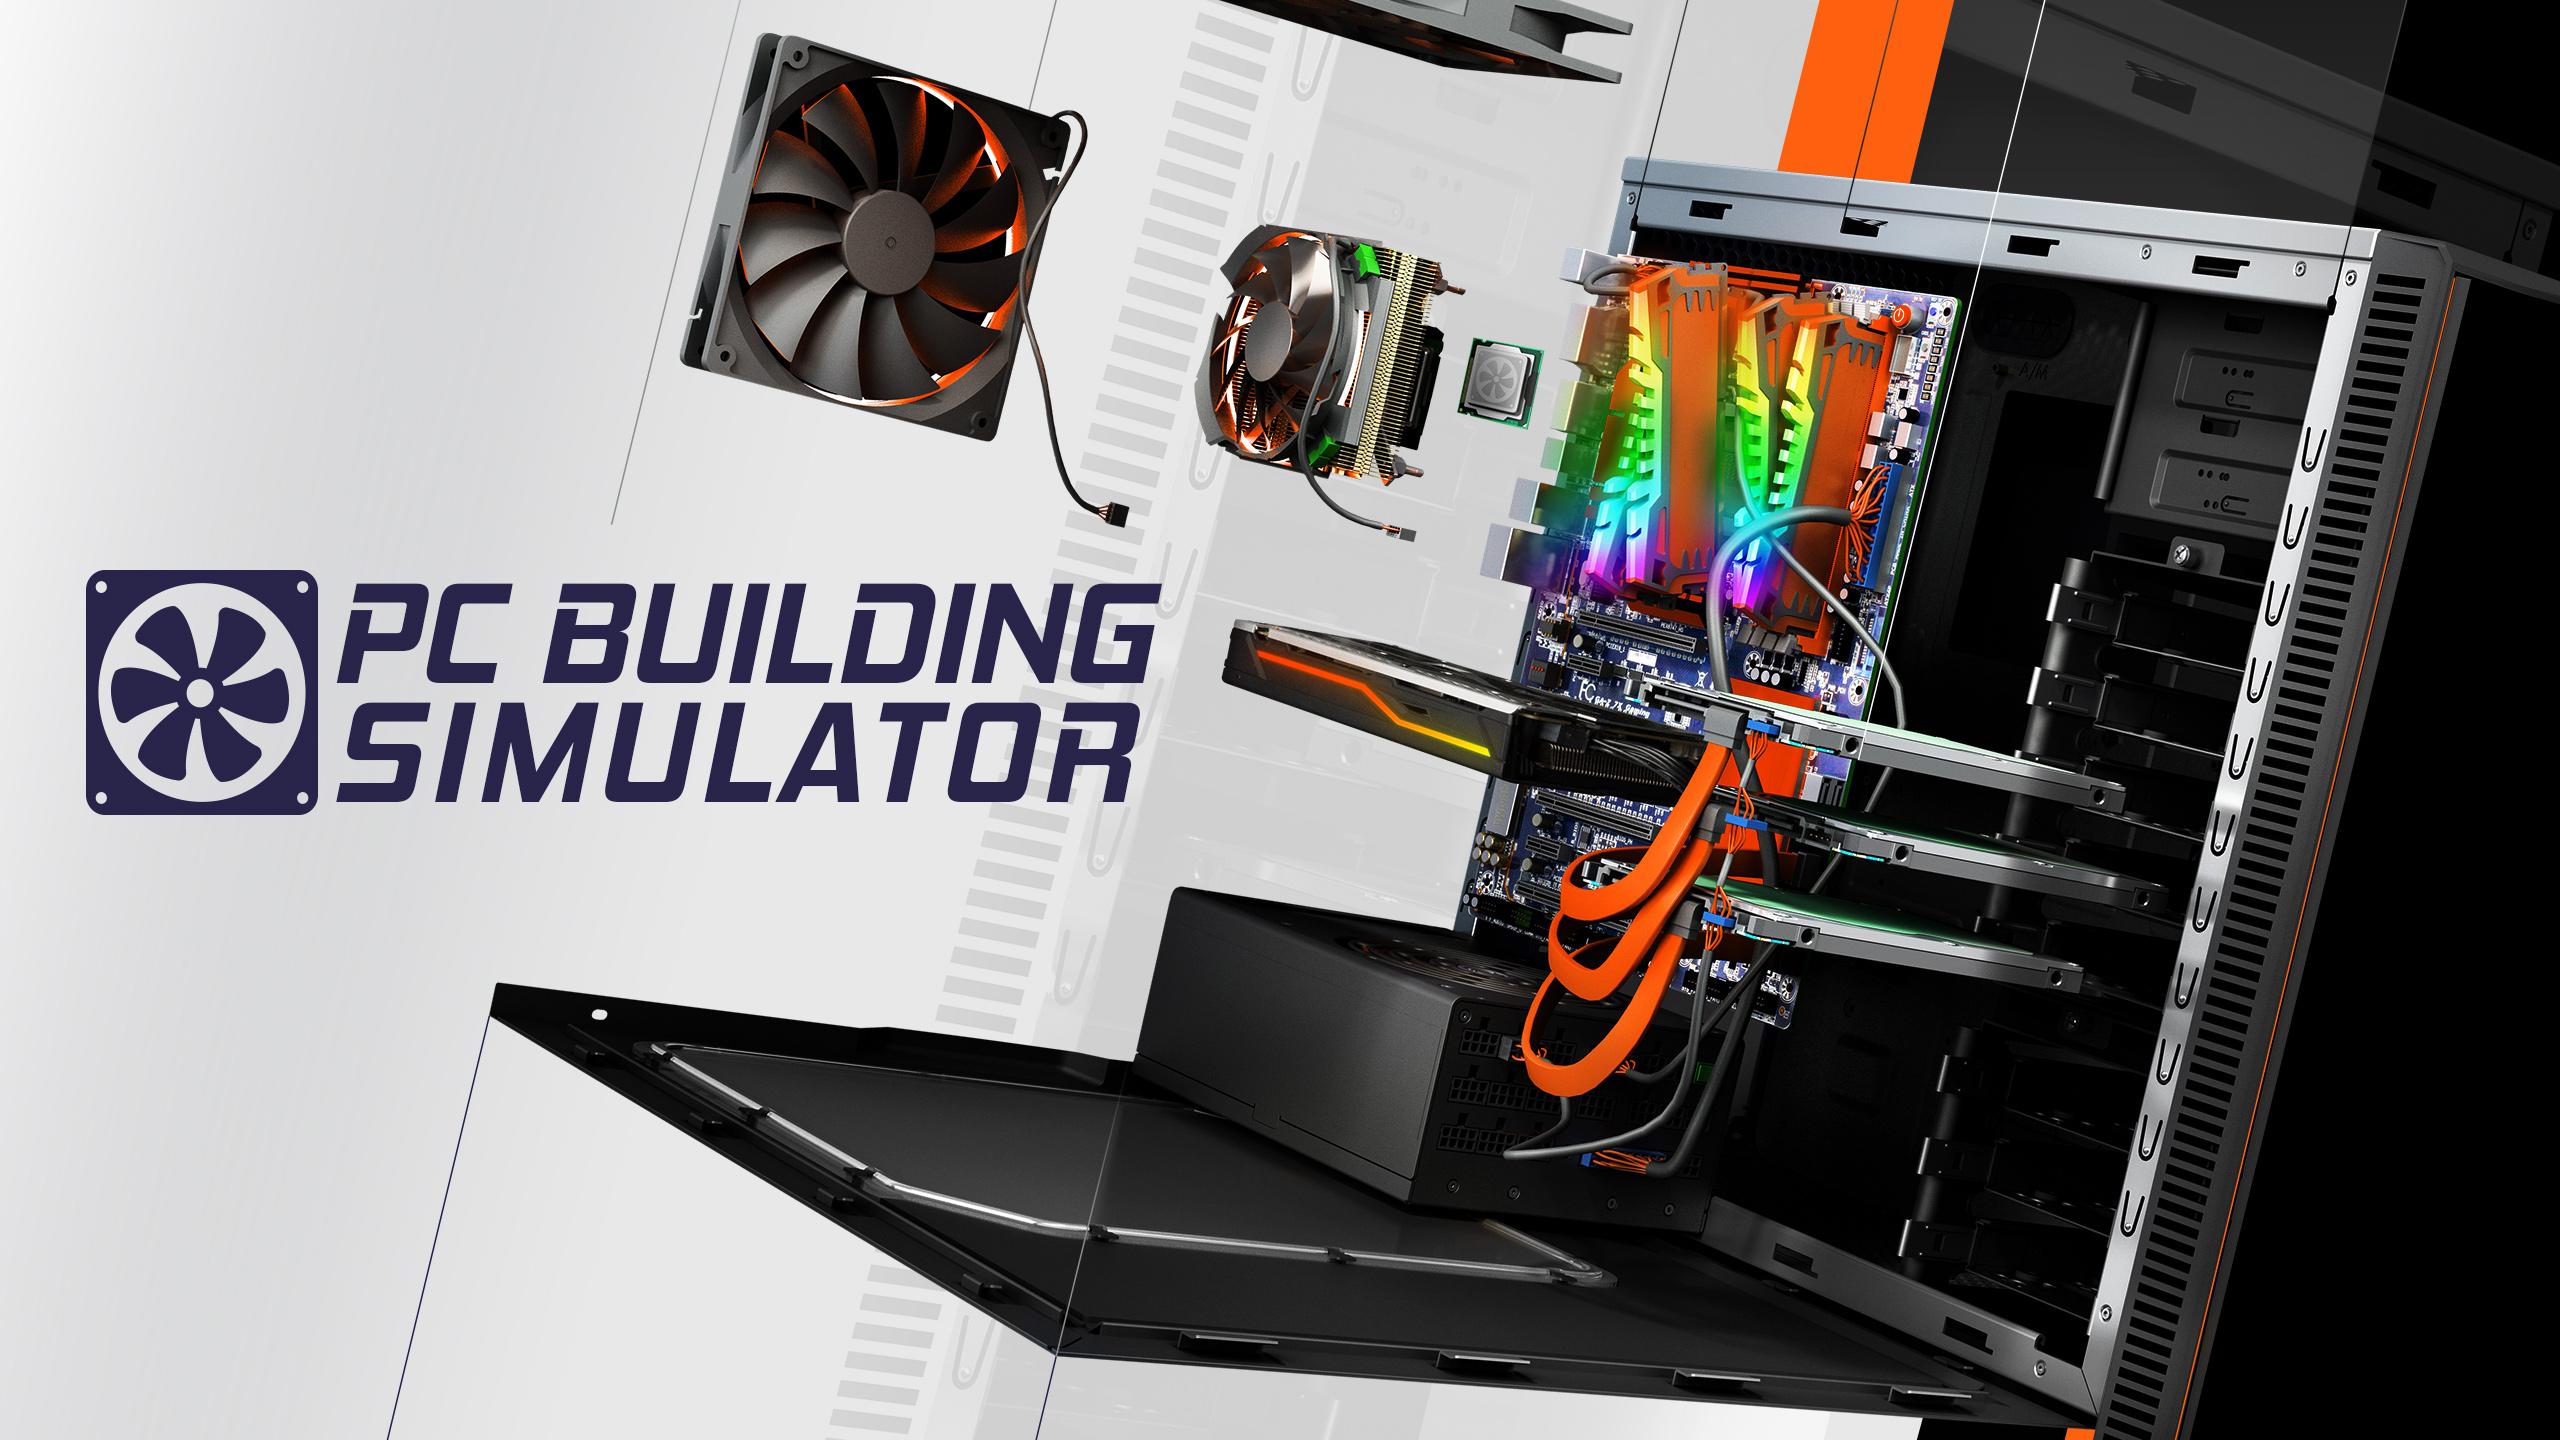 PC Building Simulator Thumbnail